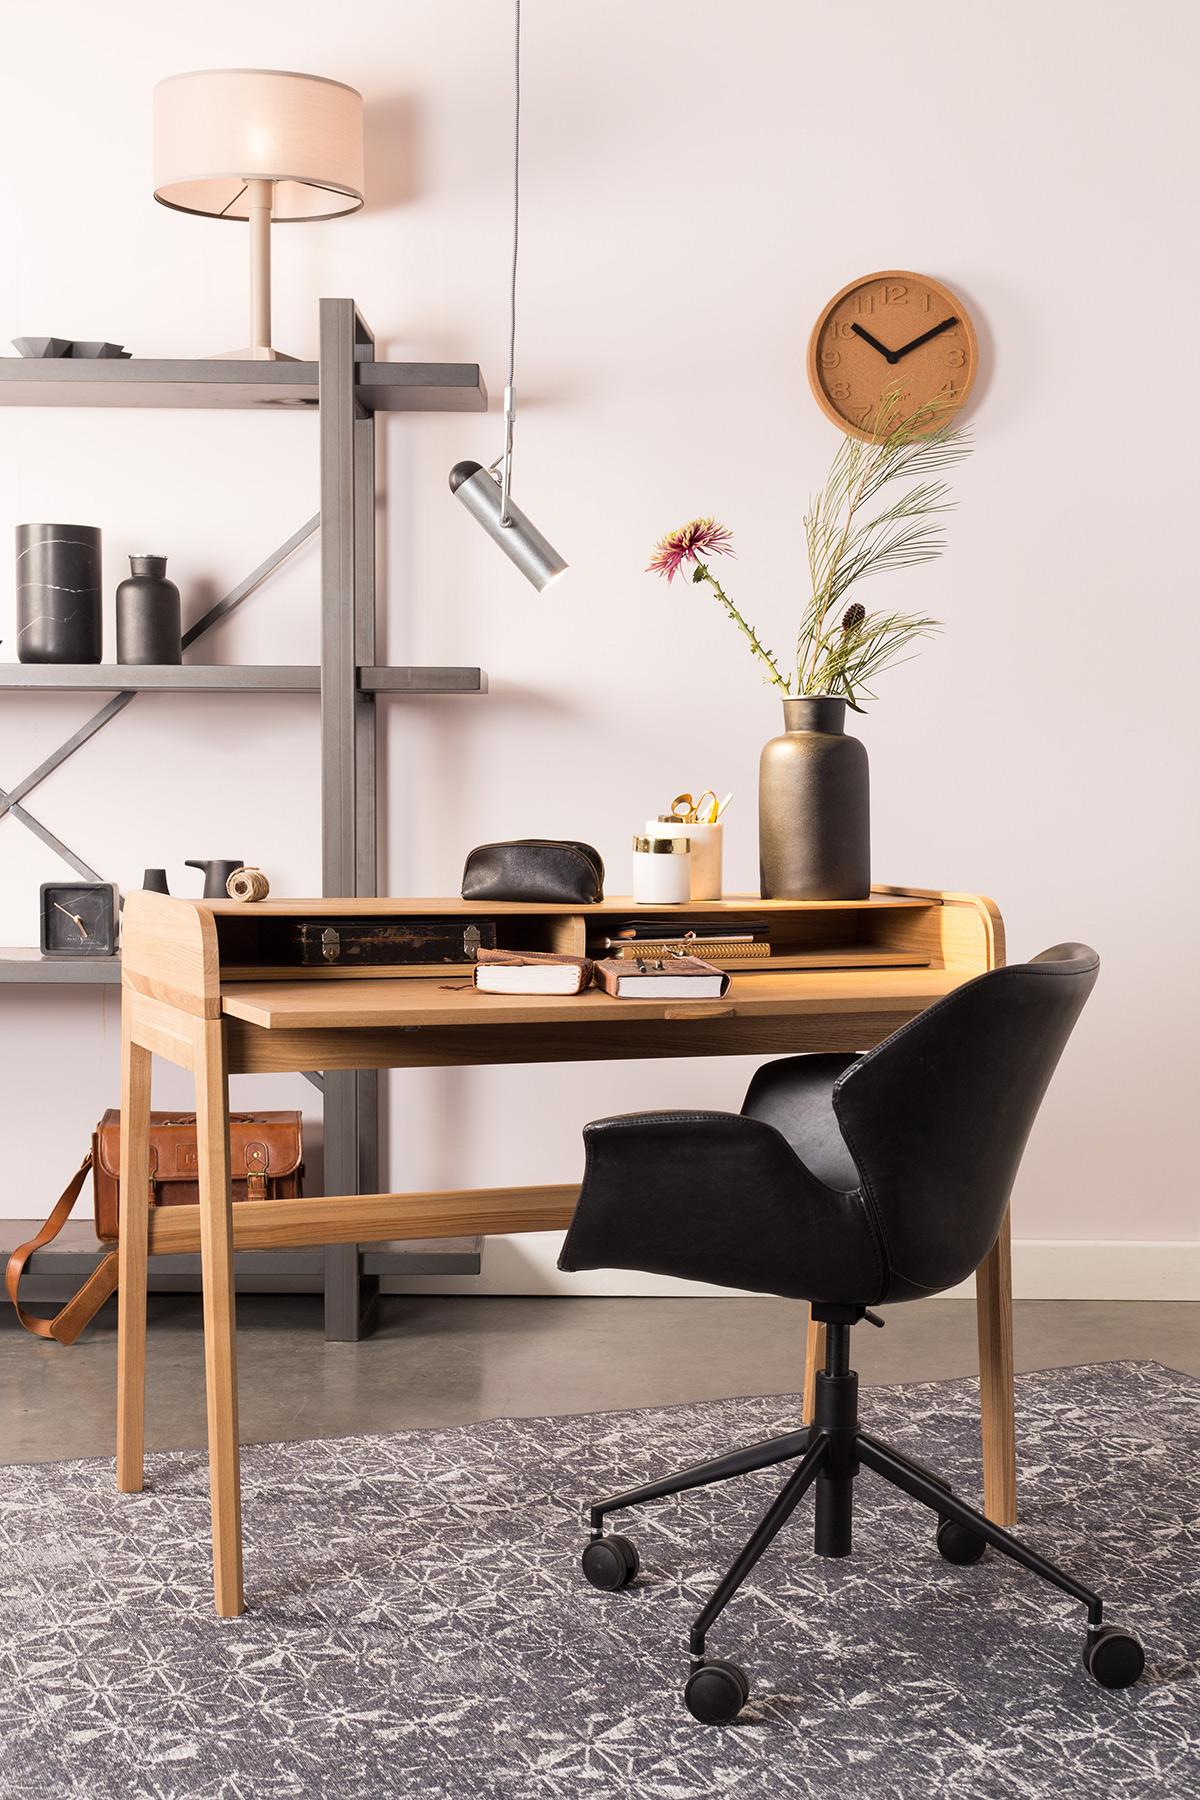 thuiswerkplek met zwarte bureaustoel